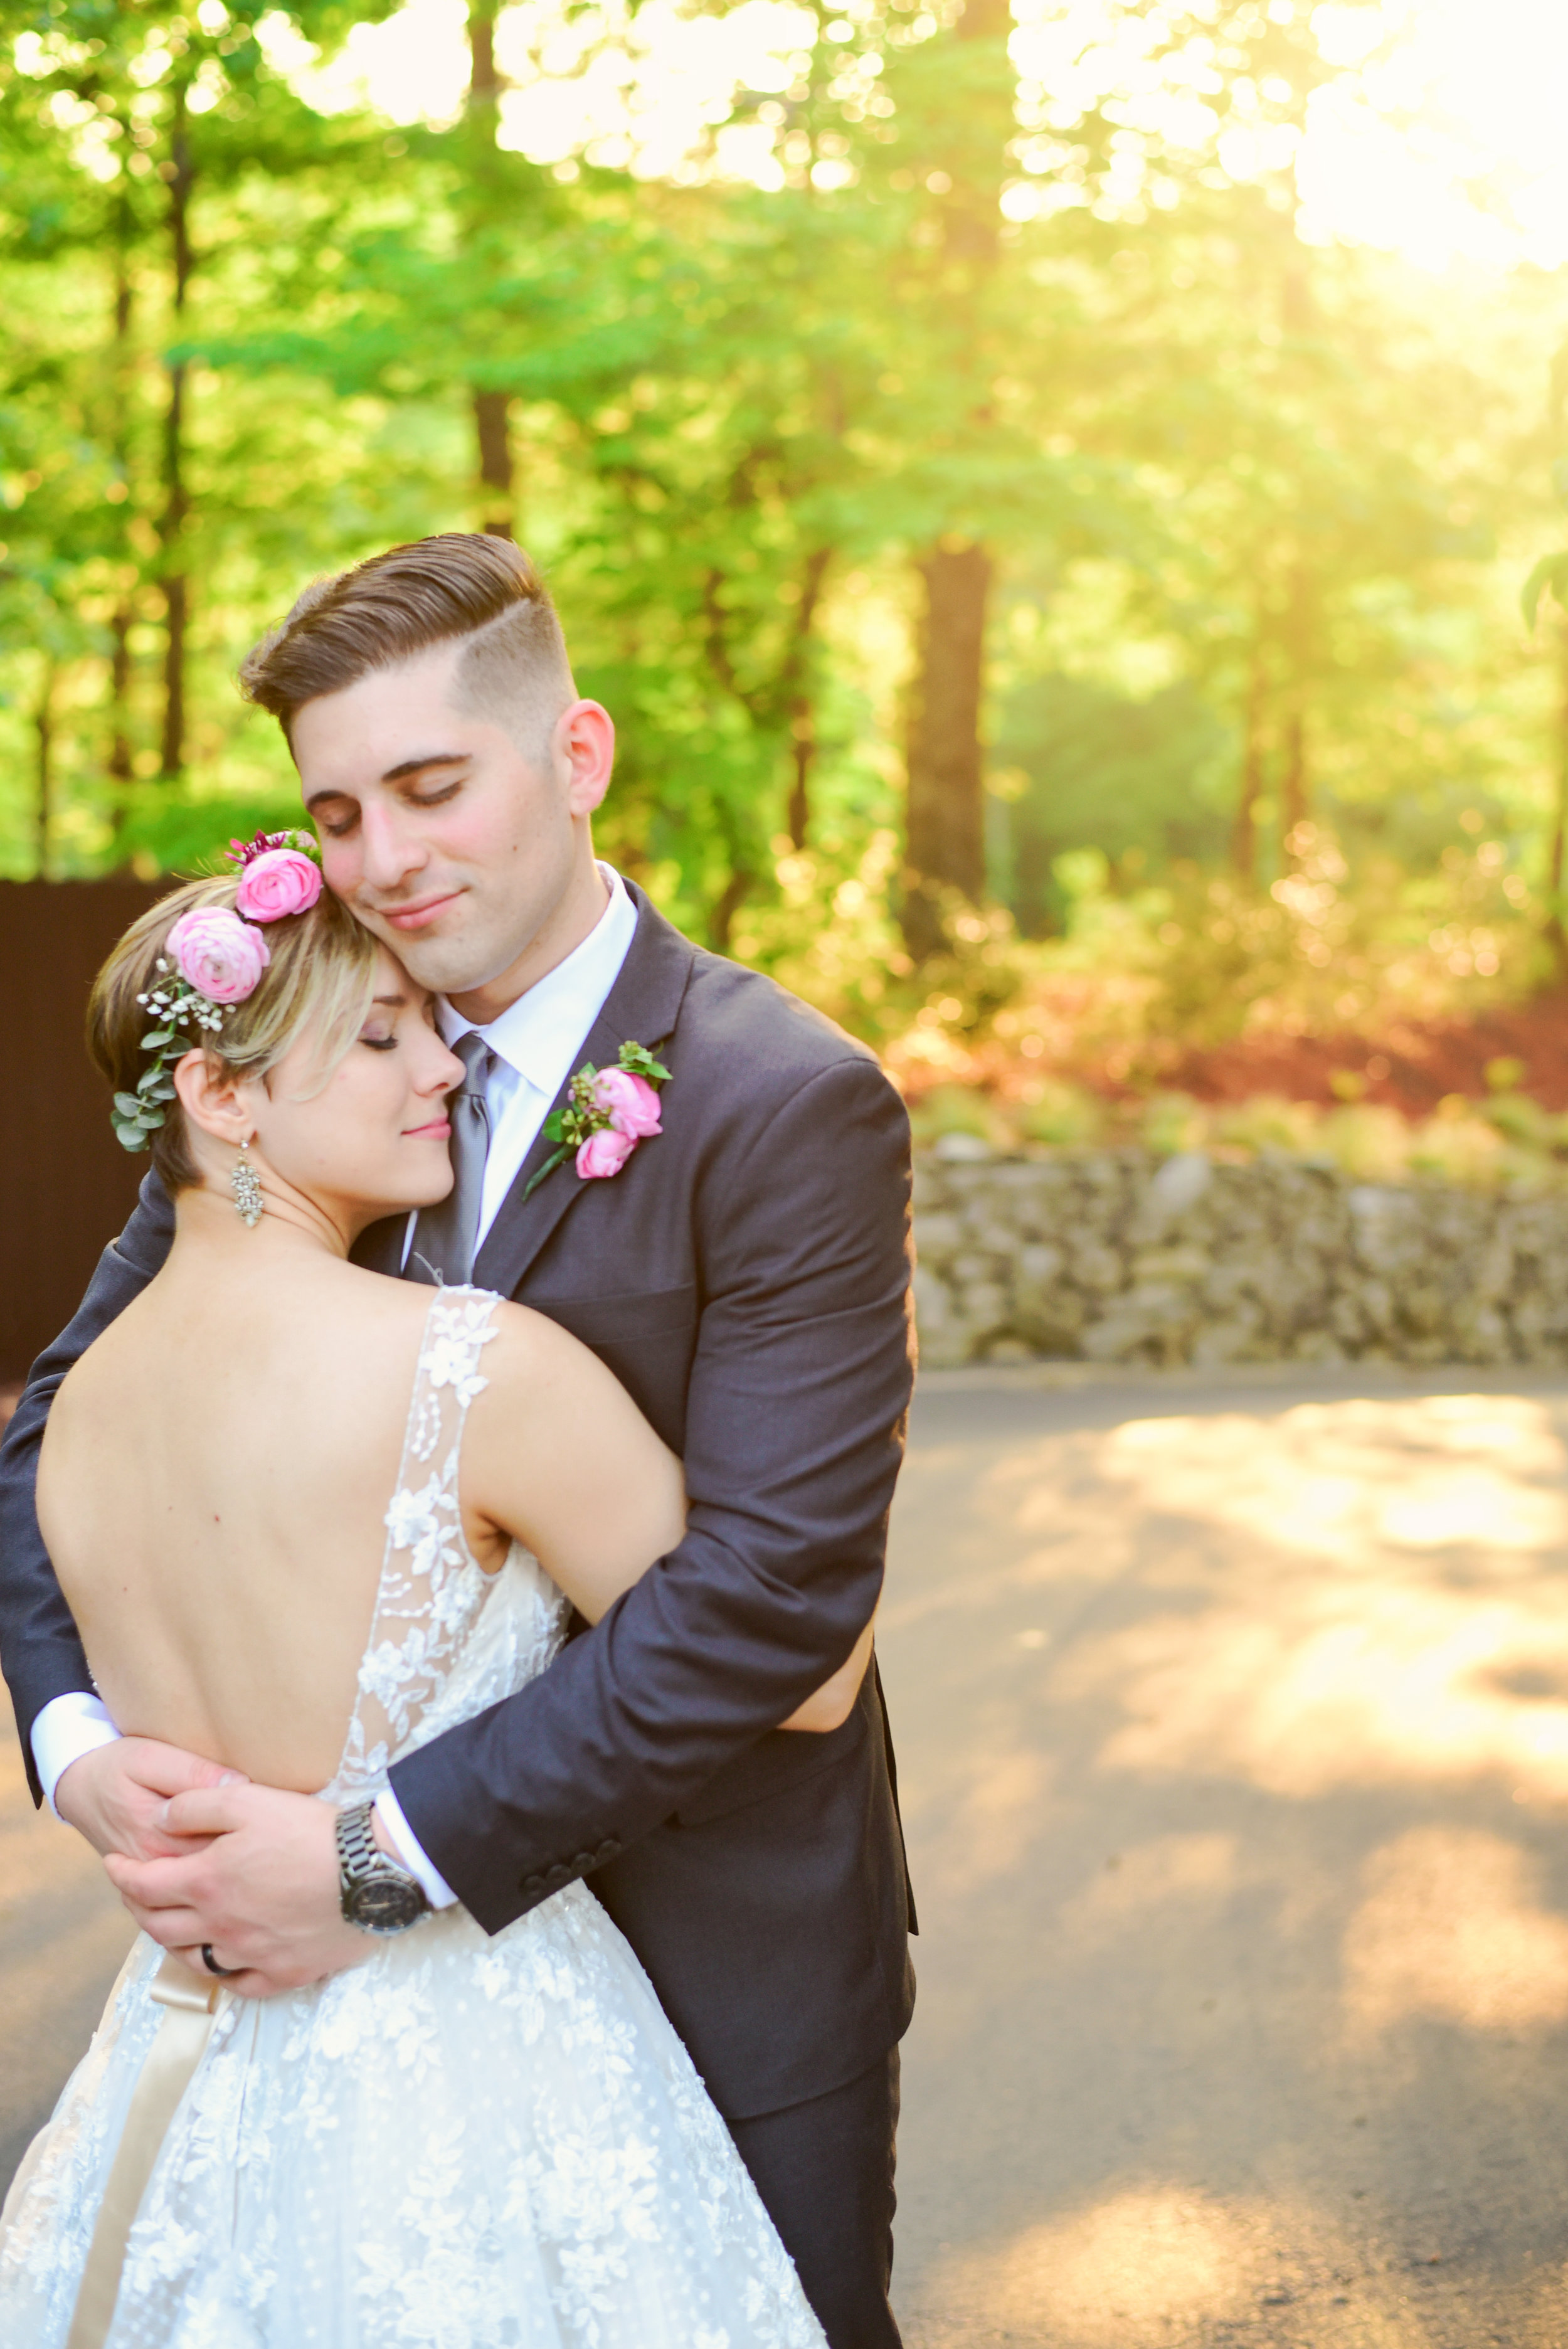 Highgrove Estate Bride and Groom